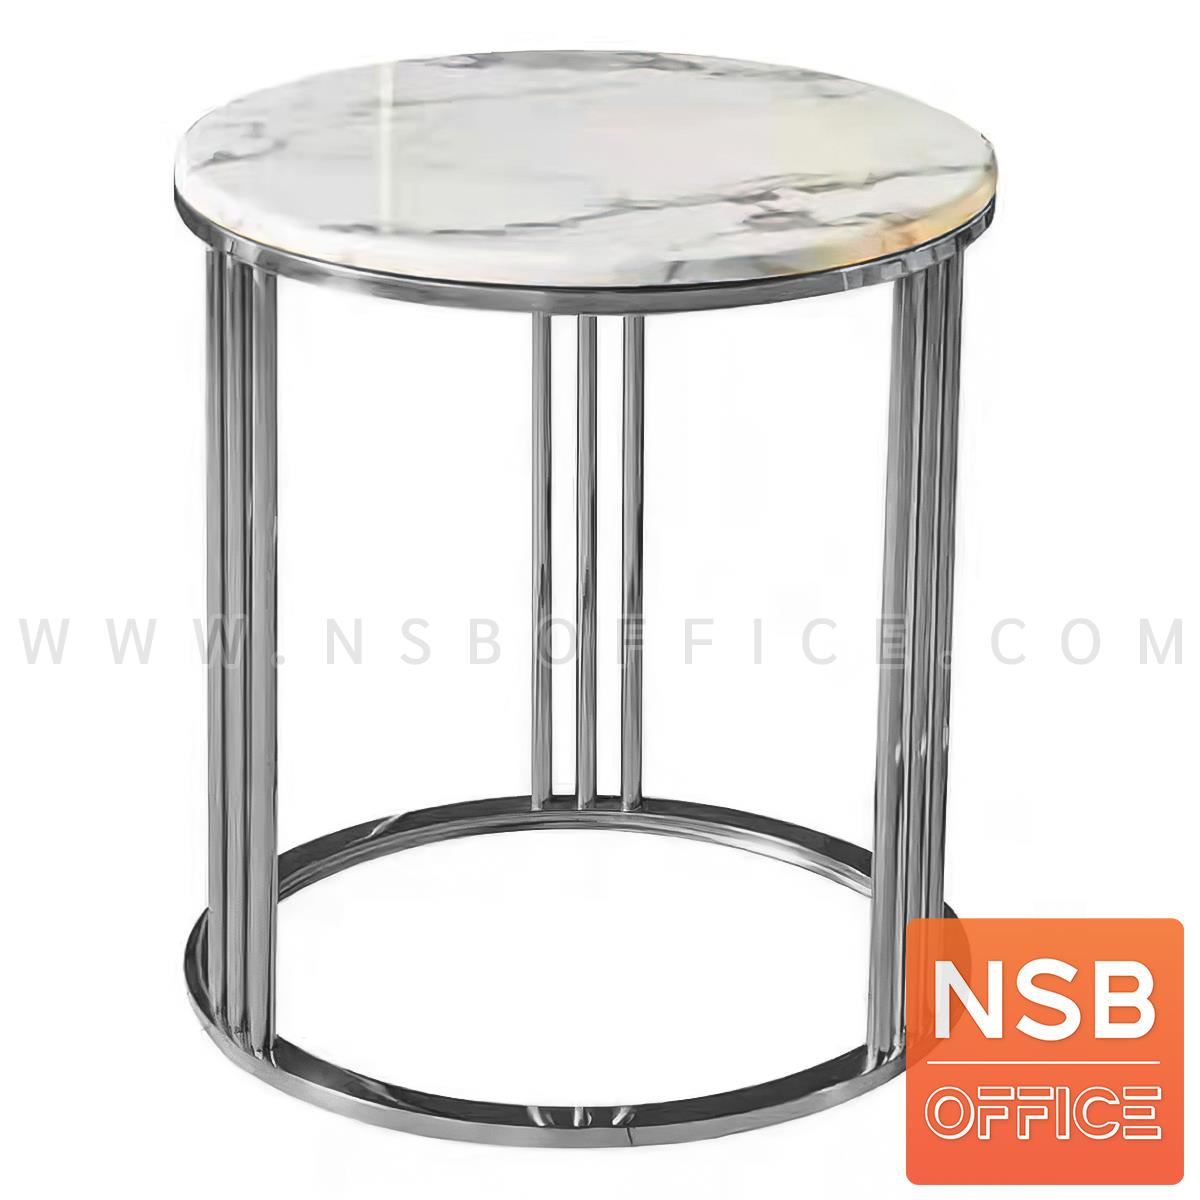 B13A264:โต๊ะกลาง รุ่น WHITEHORSE (ไวต์ฮอร์ส) ขนาด 45Di cm. ขาสเตนเลส ท็อปหินอ่อน